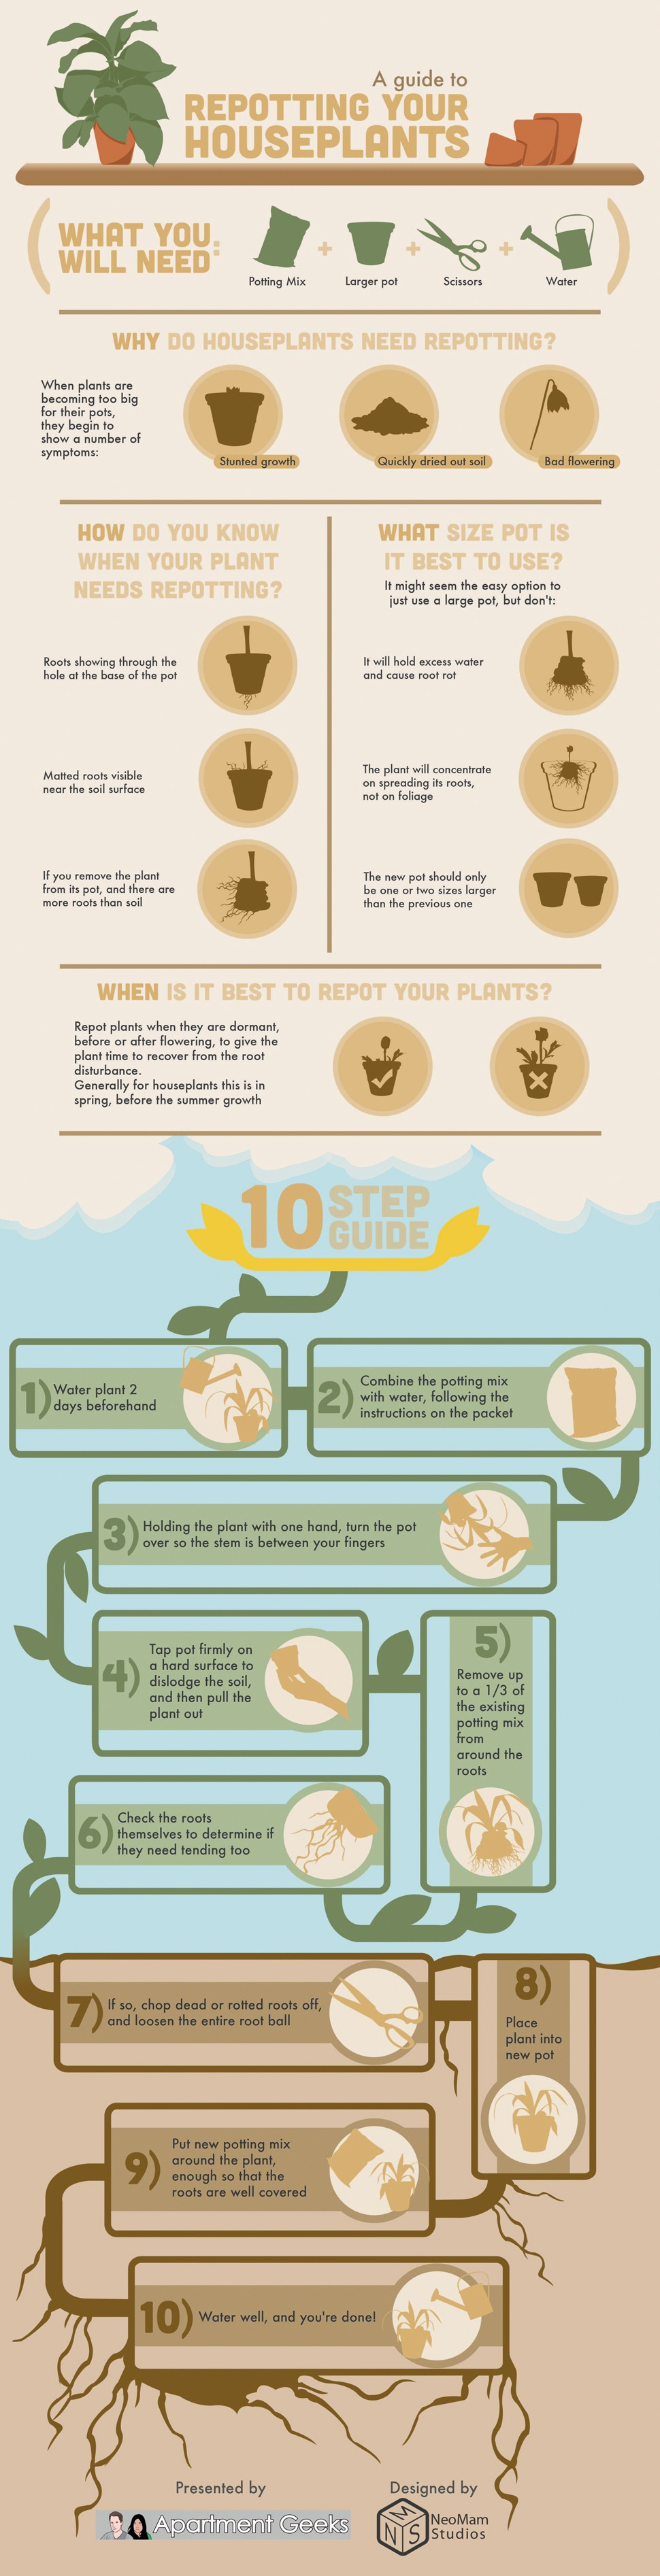 Repotting Houseplants Tips-Infographic